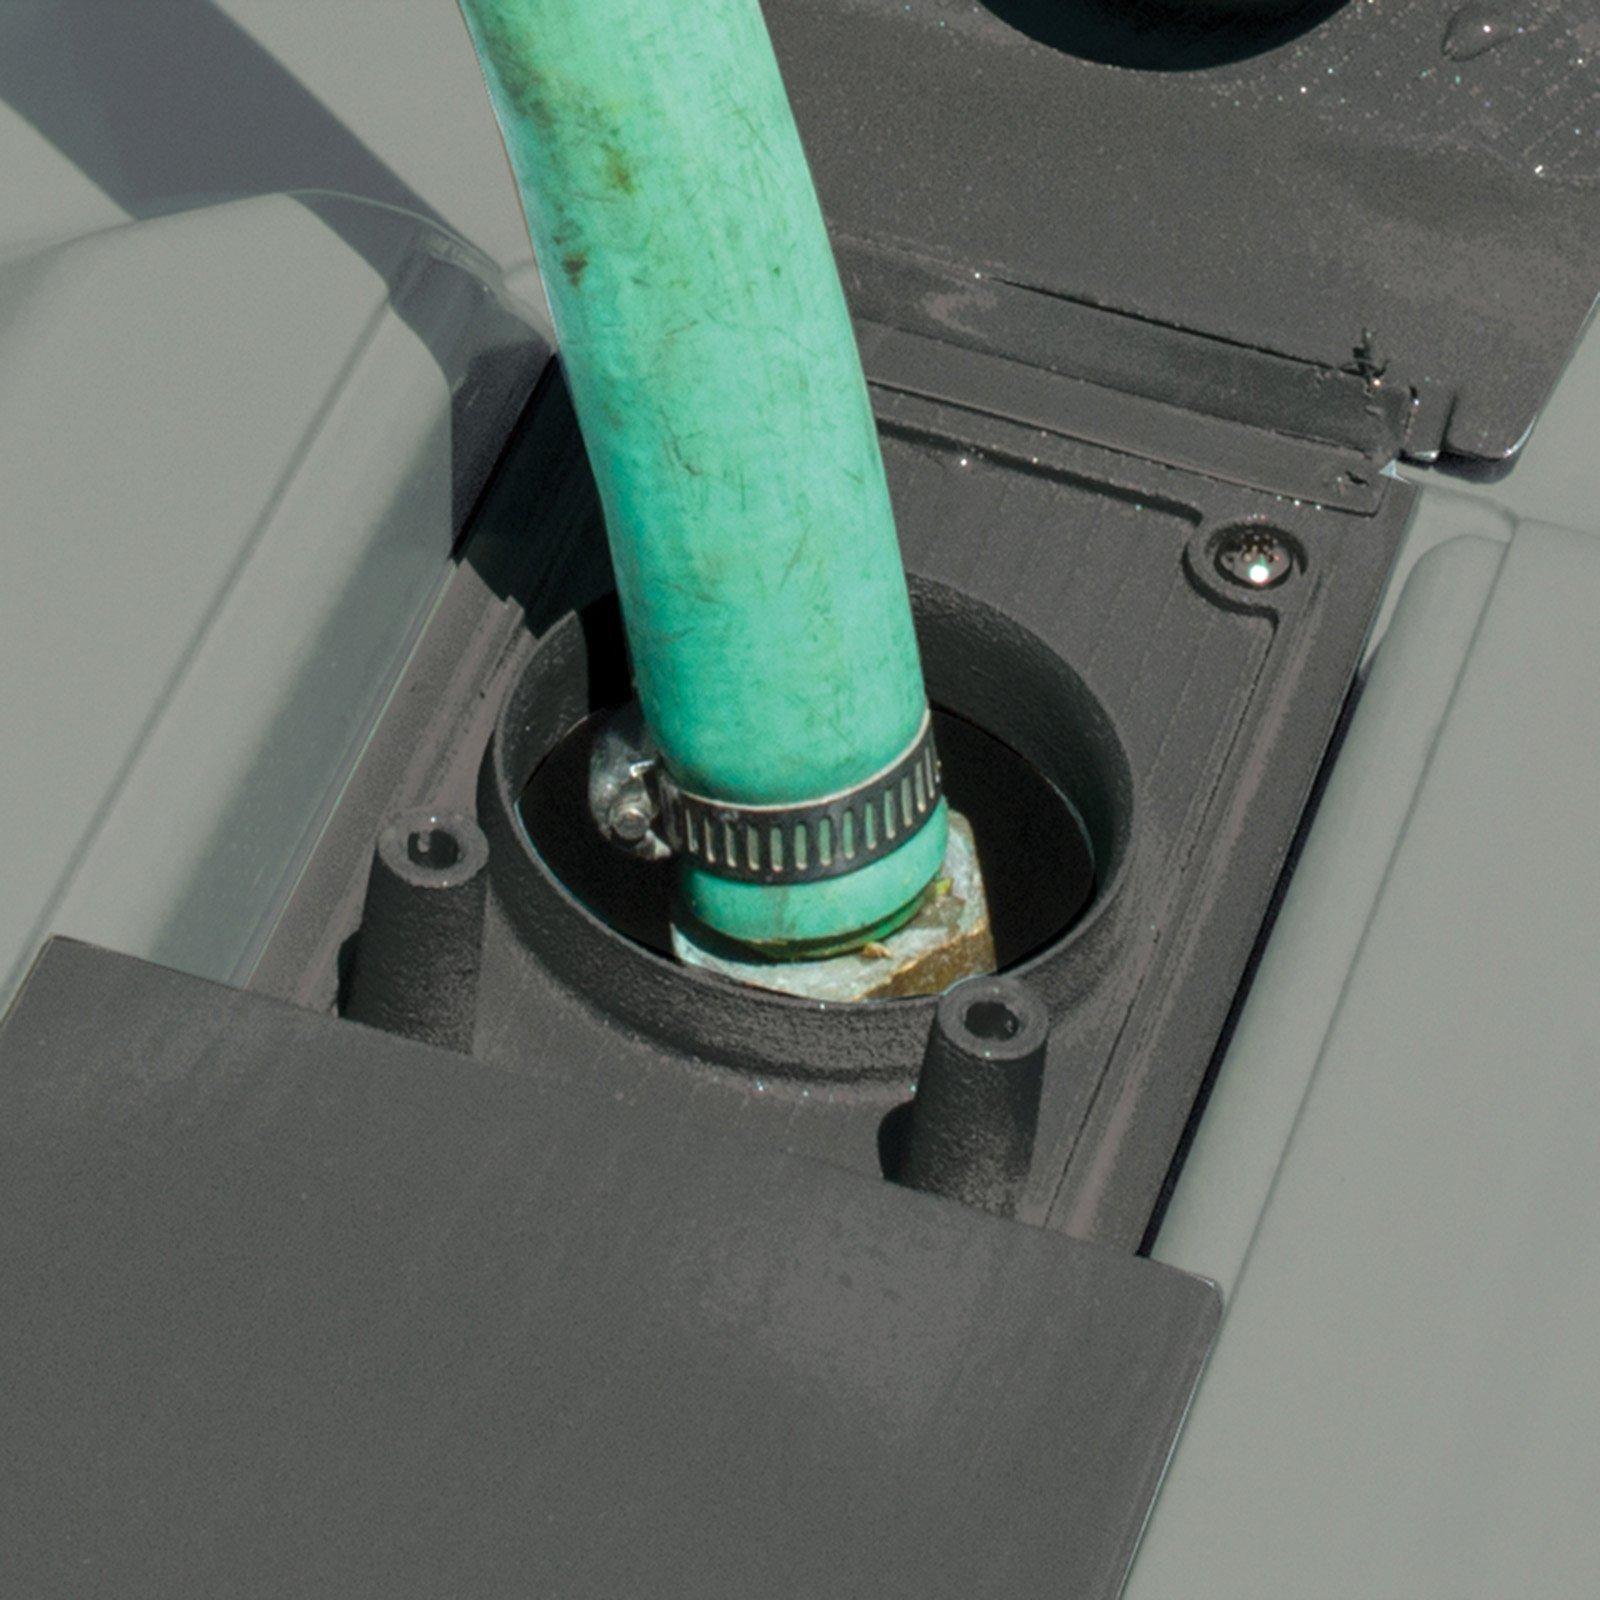 SmartTote2 40518 LX Portable RV Waste Tote Tank-4 Wheels-27 Gallons-Thetford-40518 by SmartTote2 (Image #4)